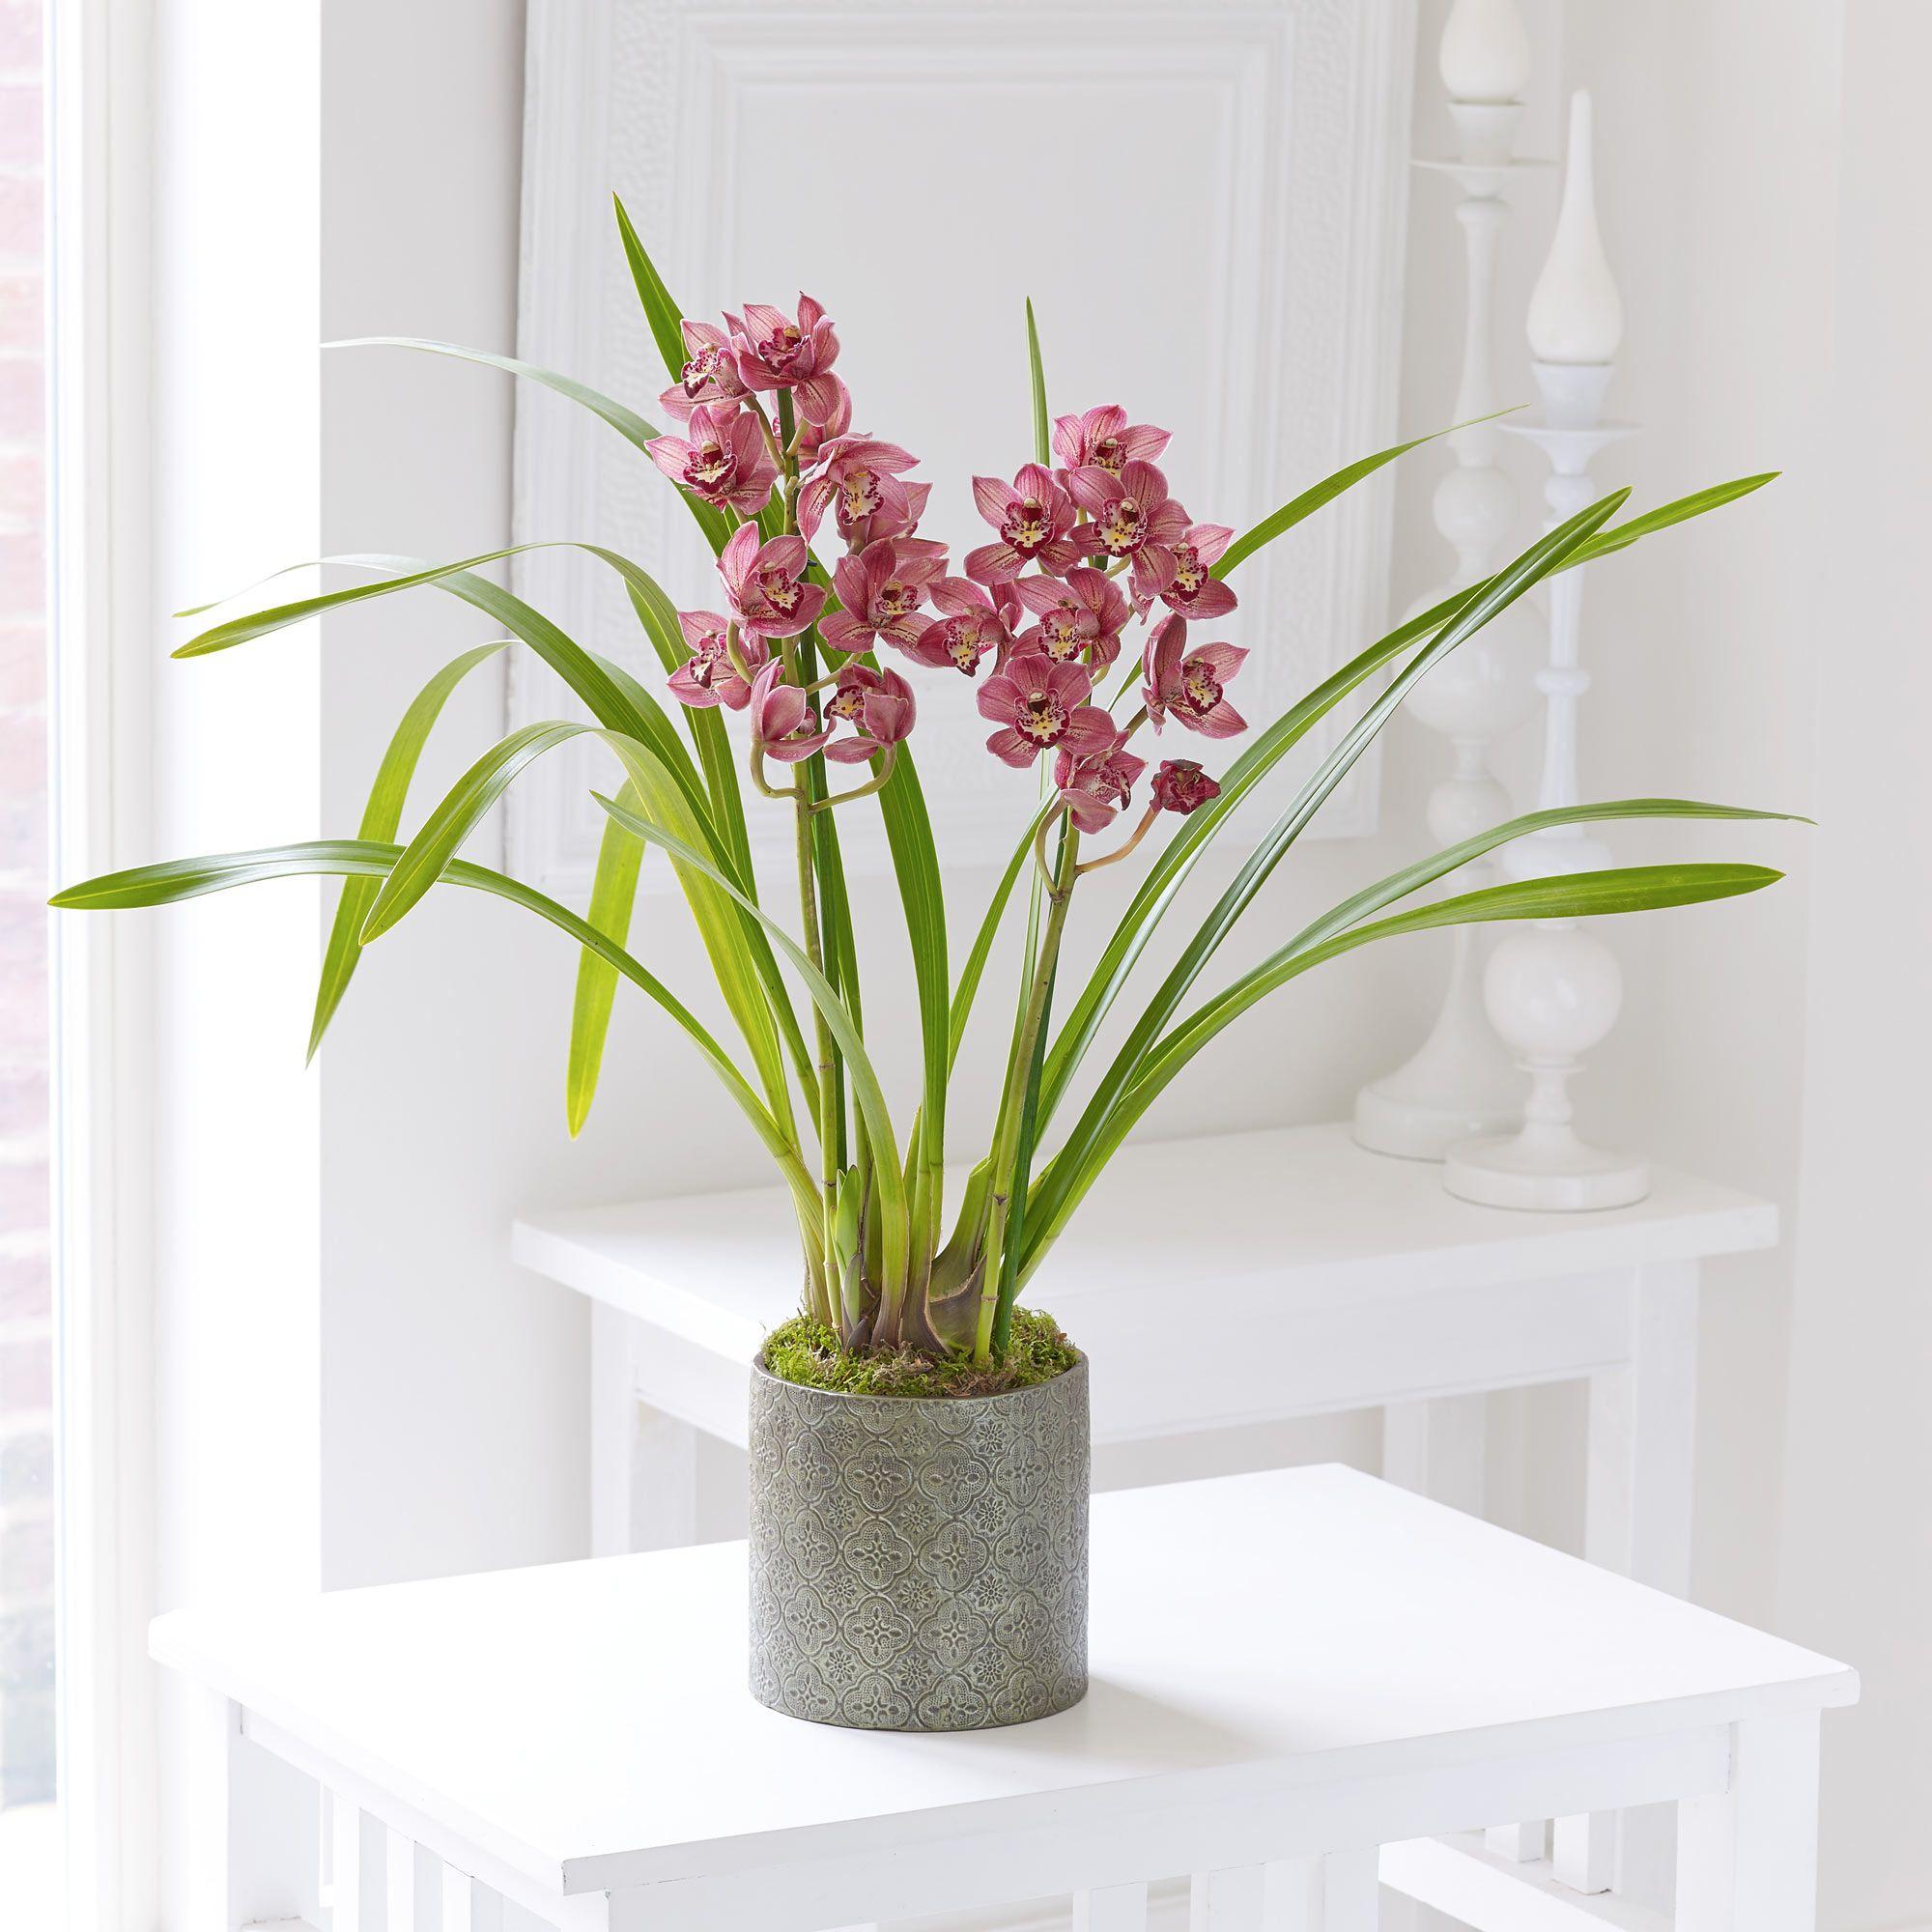 This dusky pink Cymbidium orchid looks very pretty